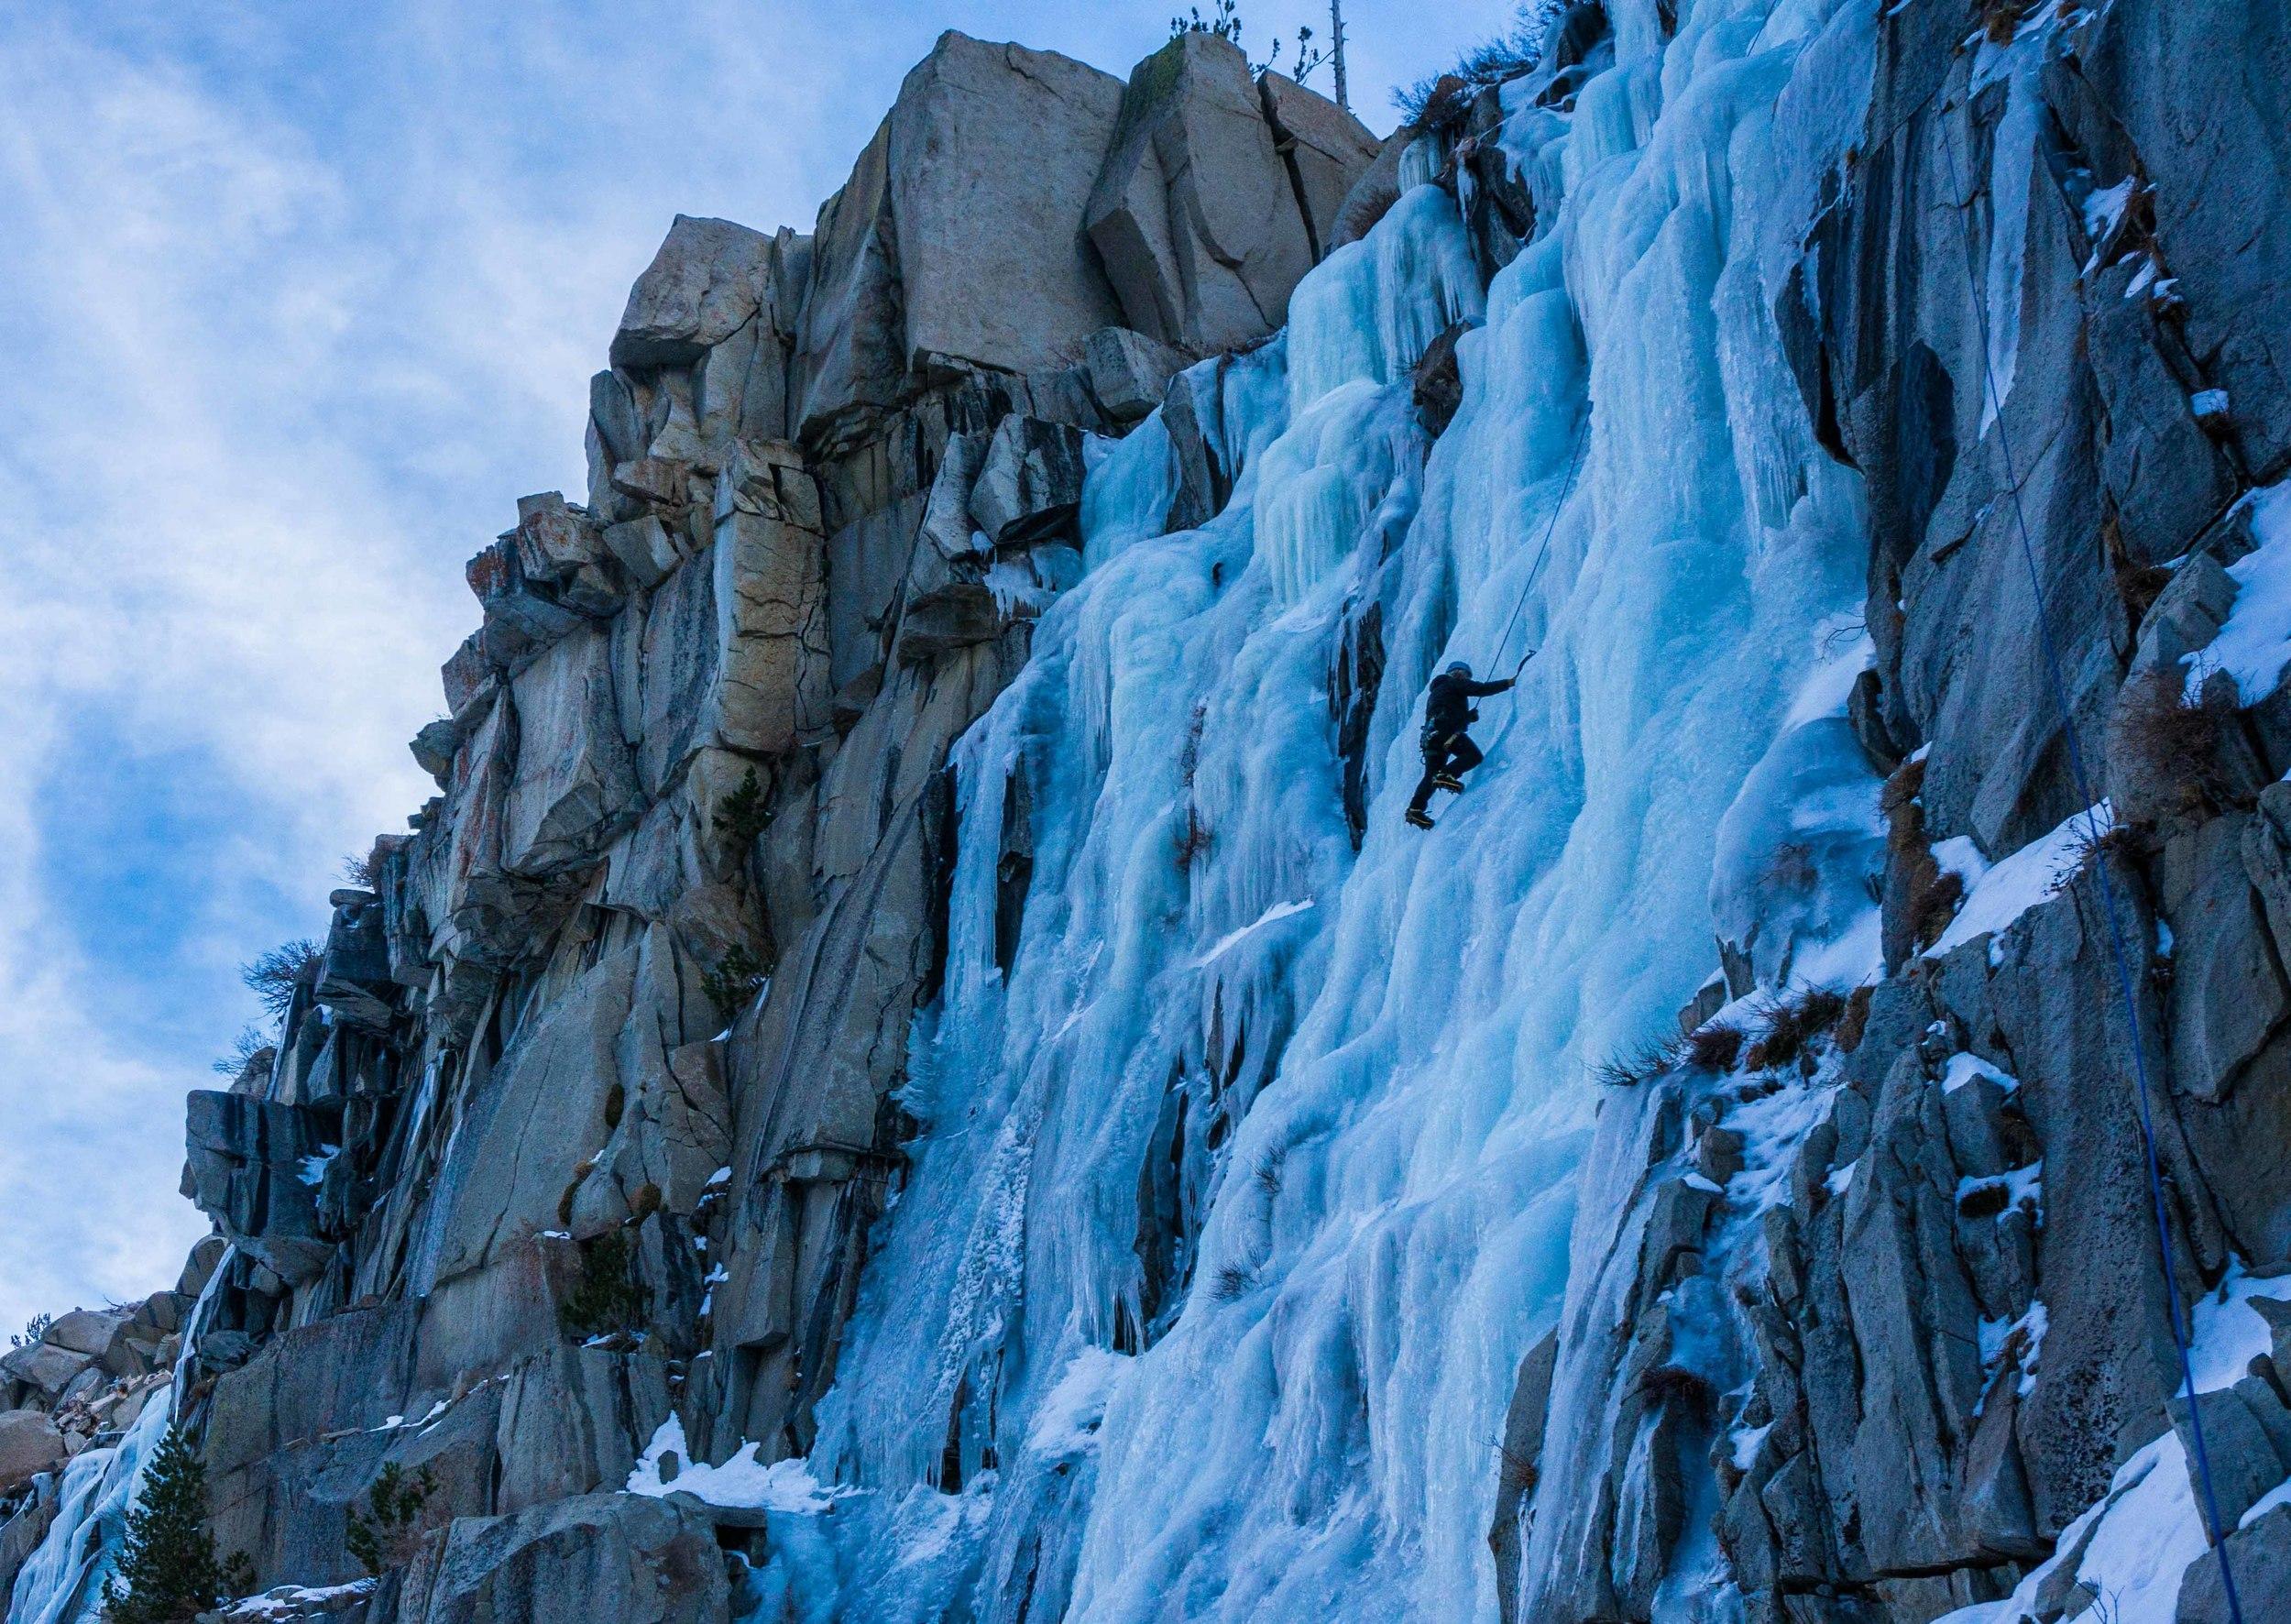 Doug enjoying the fat ice on Chouinard falls